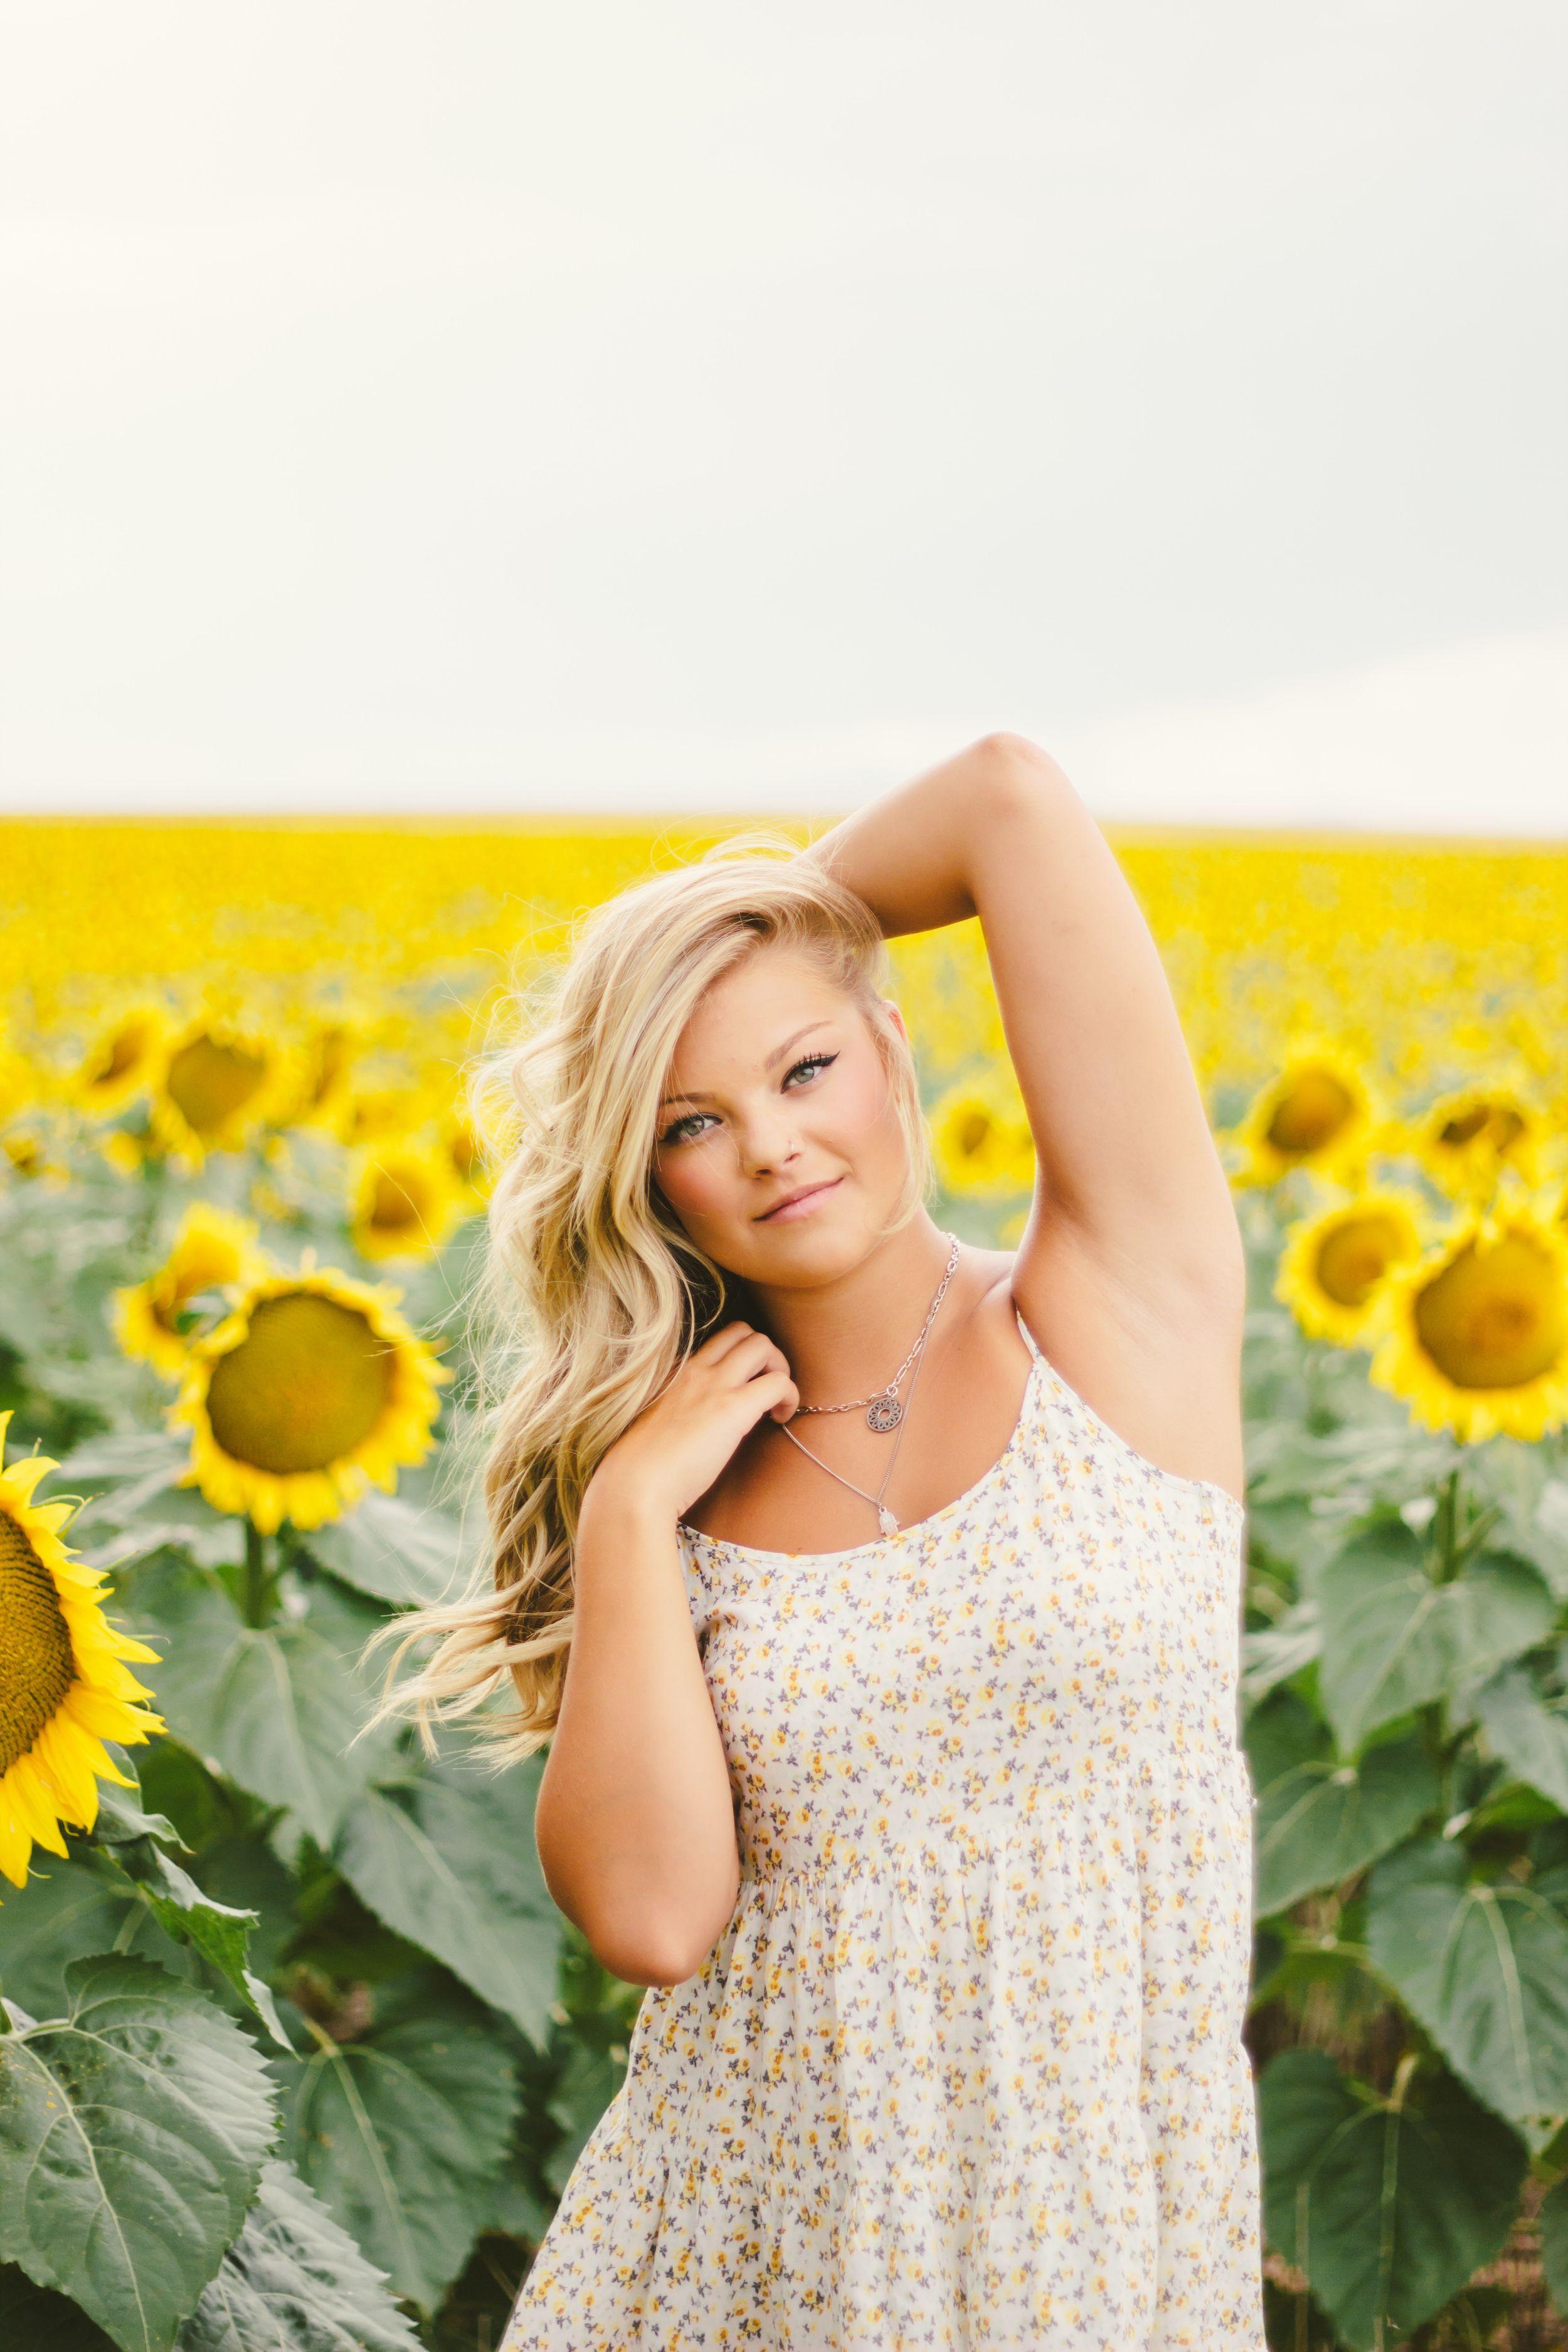 Senior photoshoot, Senior photos, sunflowers, sunflower ...